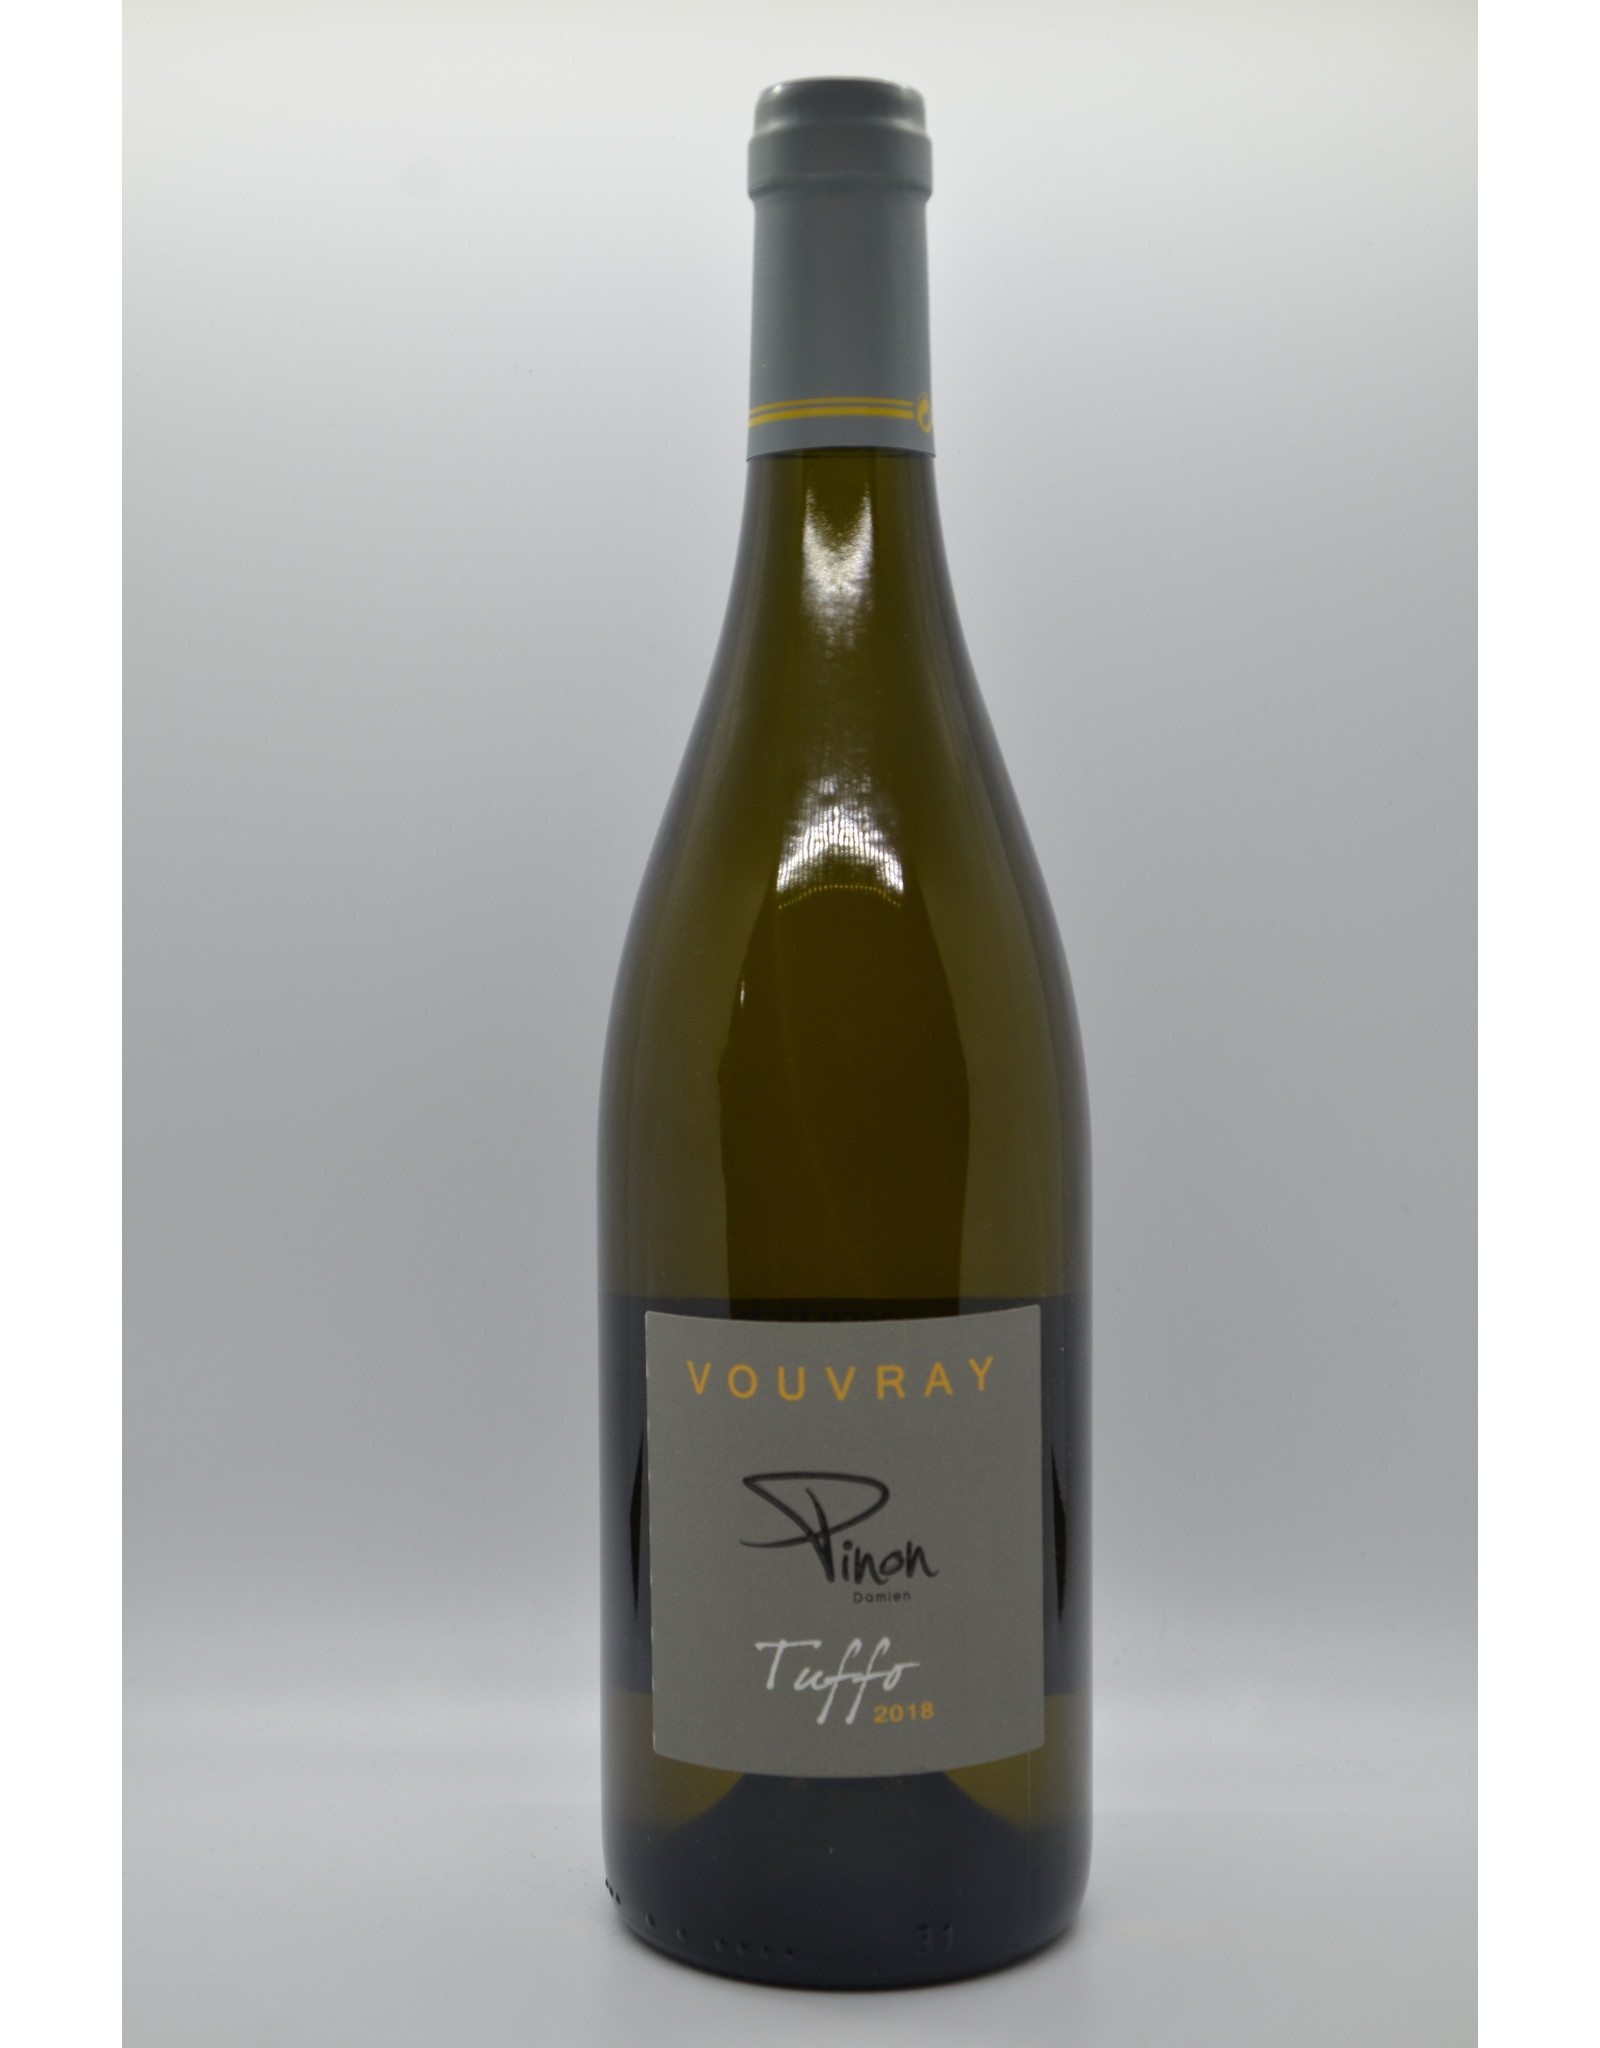 France Pinon Tuffo Vouvray